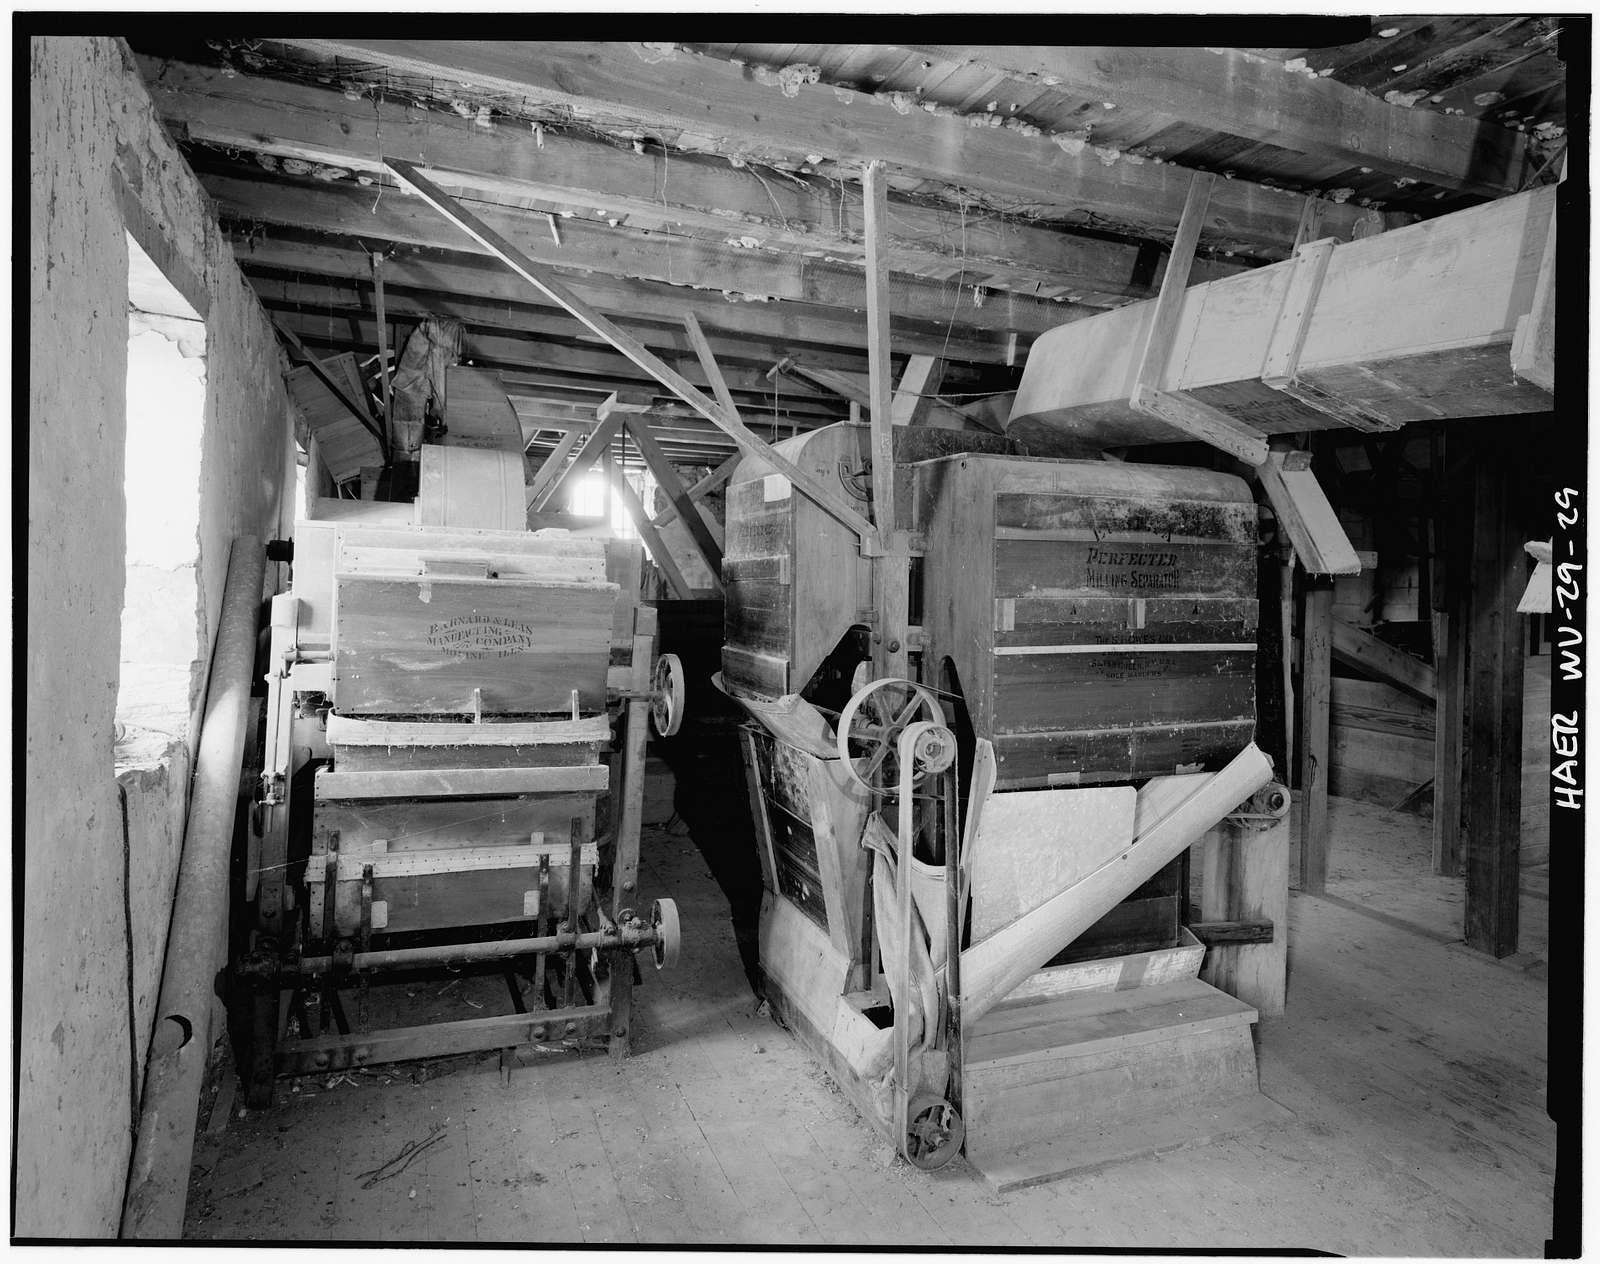 Bunker Hill Mill, County Route 26, Bunker Hill, Berkeley County, WV